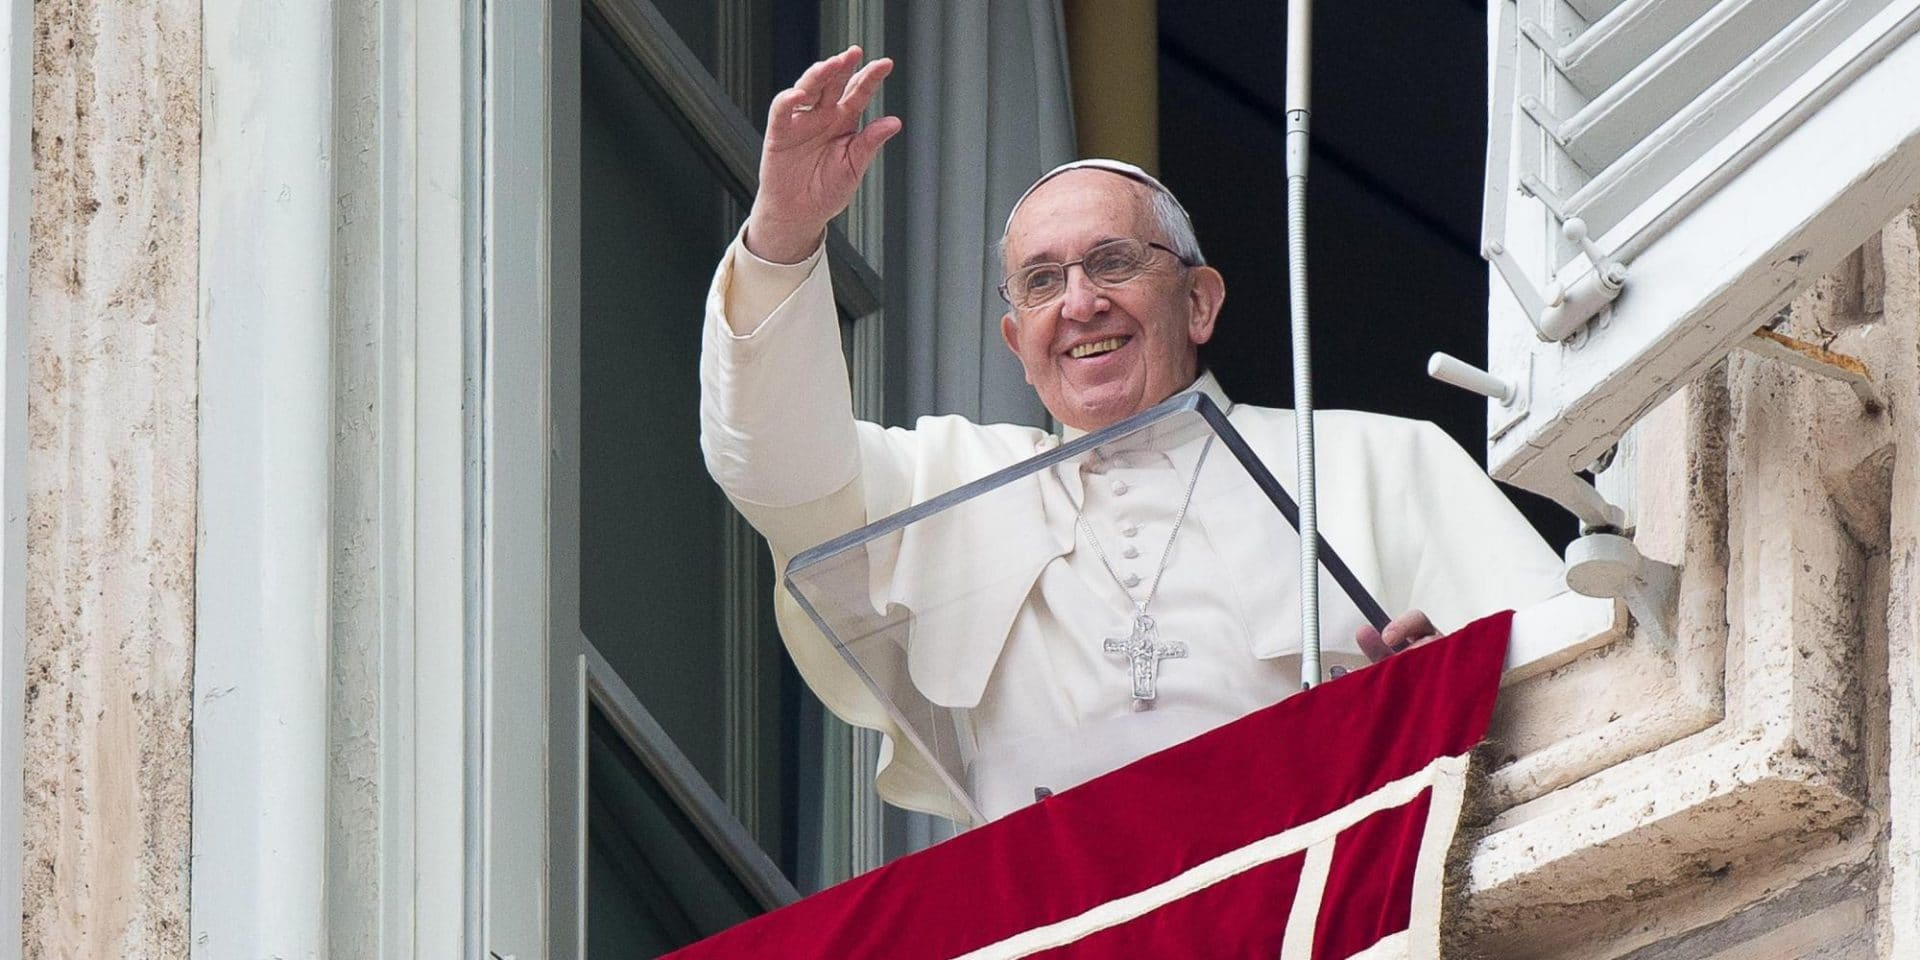 Risultati immagini per immagine di papa francescoangelus di papa francesco di oggi